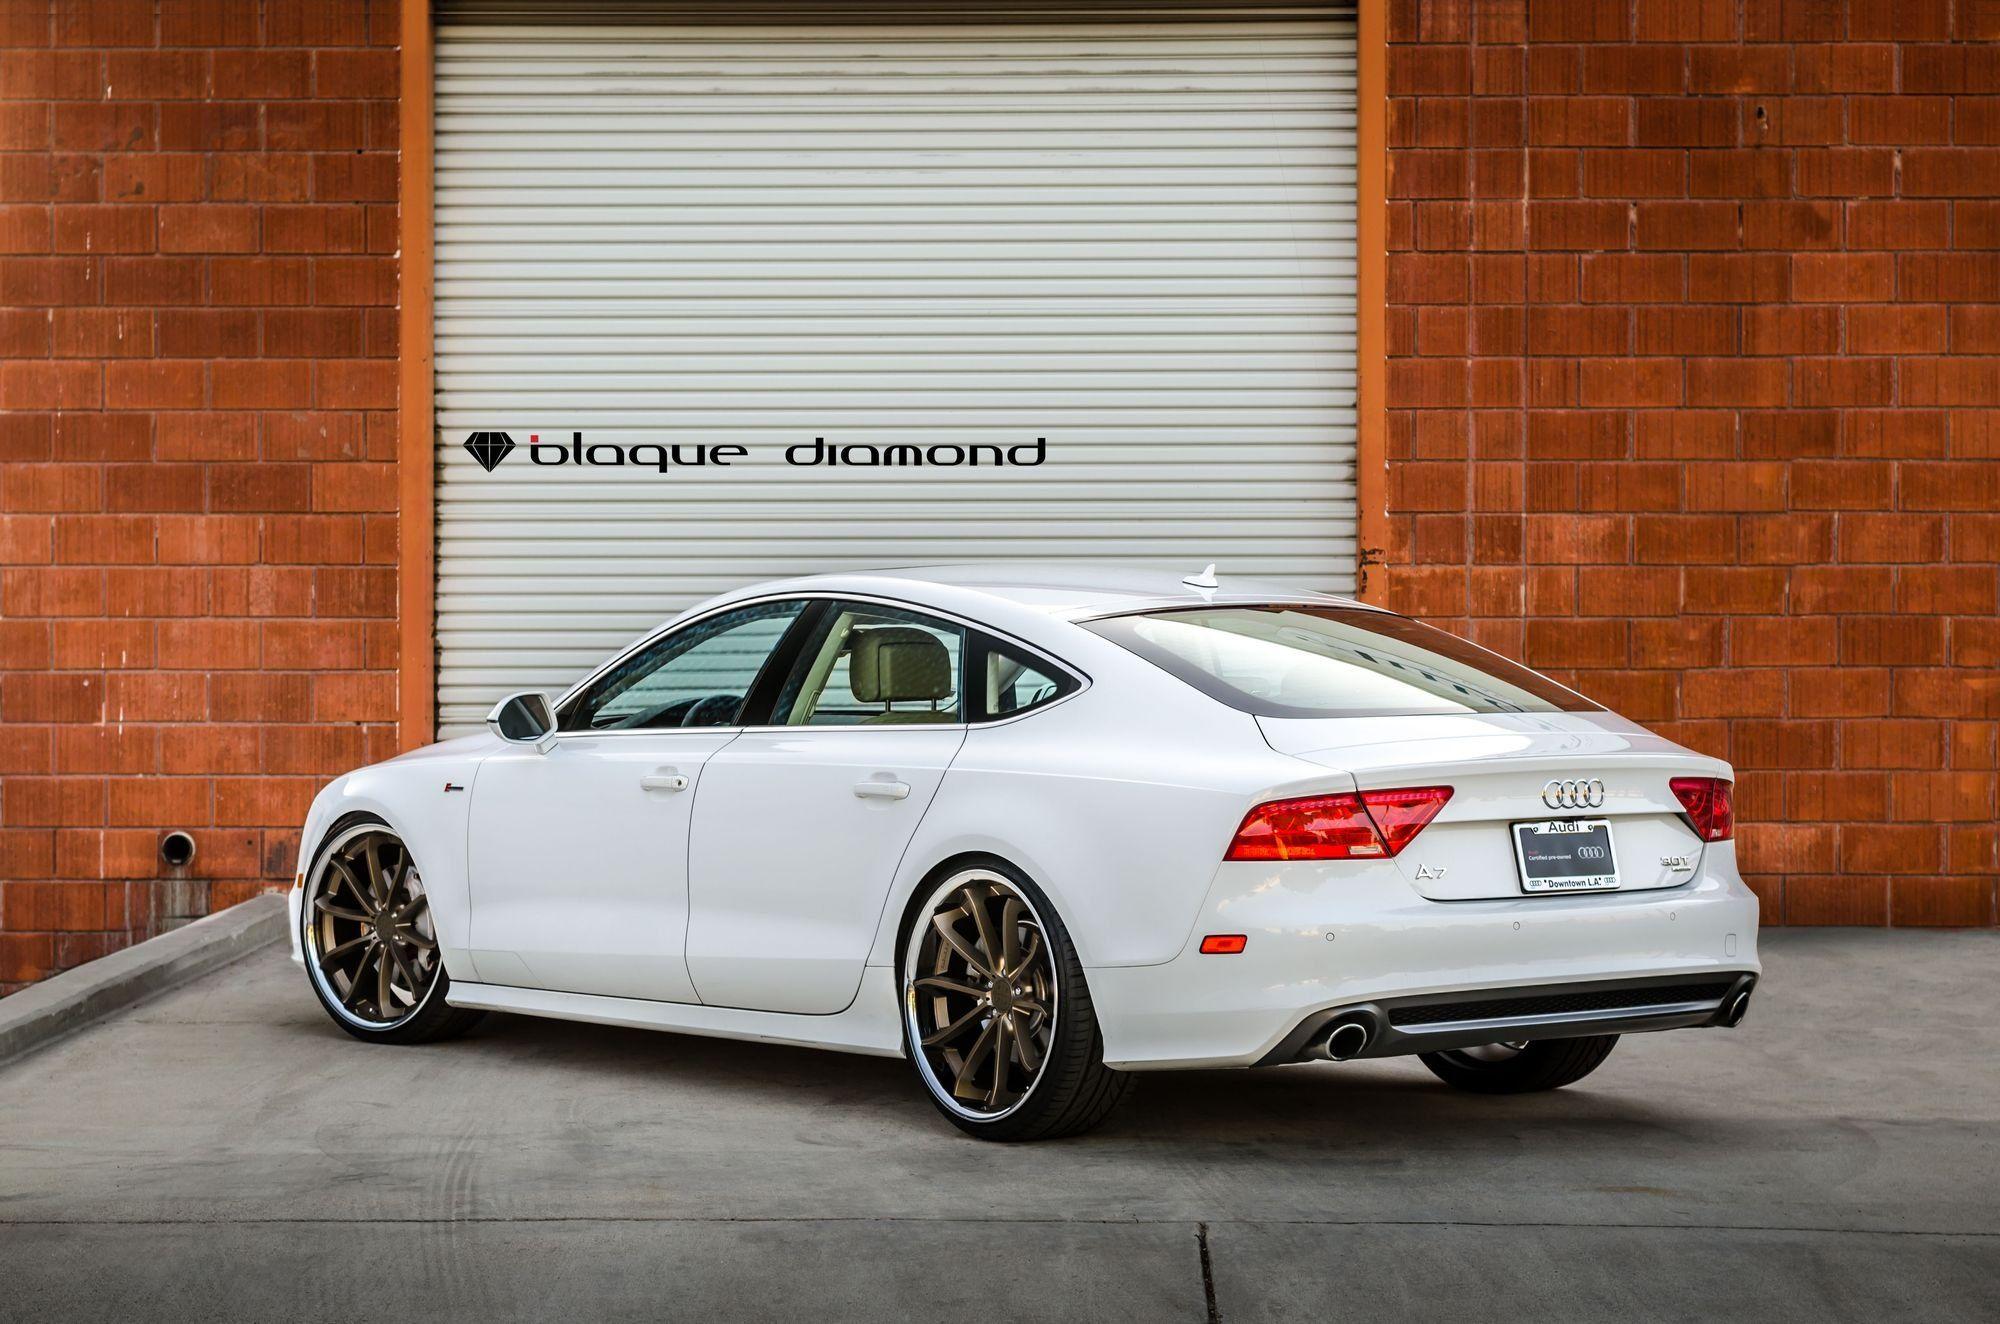 Extremely Stylish White Audi A7 Featuring Bronze Blaque Diamond Rims Audi A7 Audi Diamond Rims